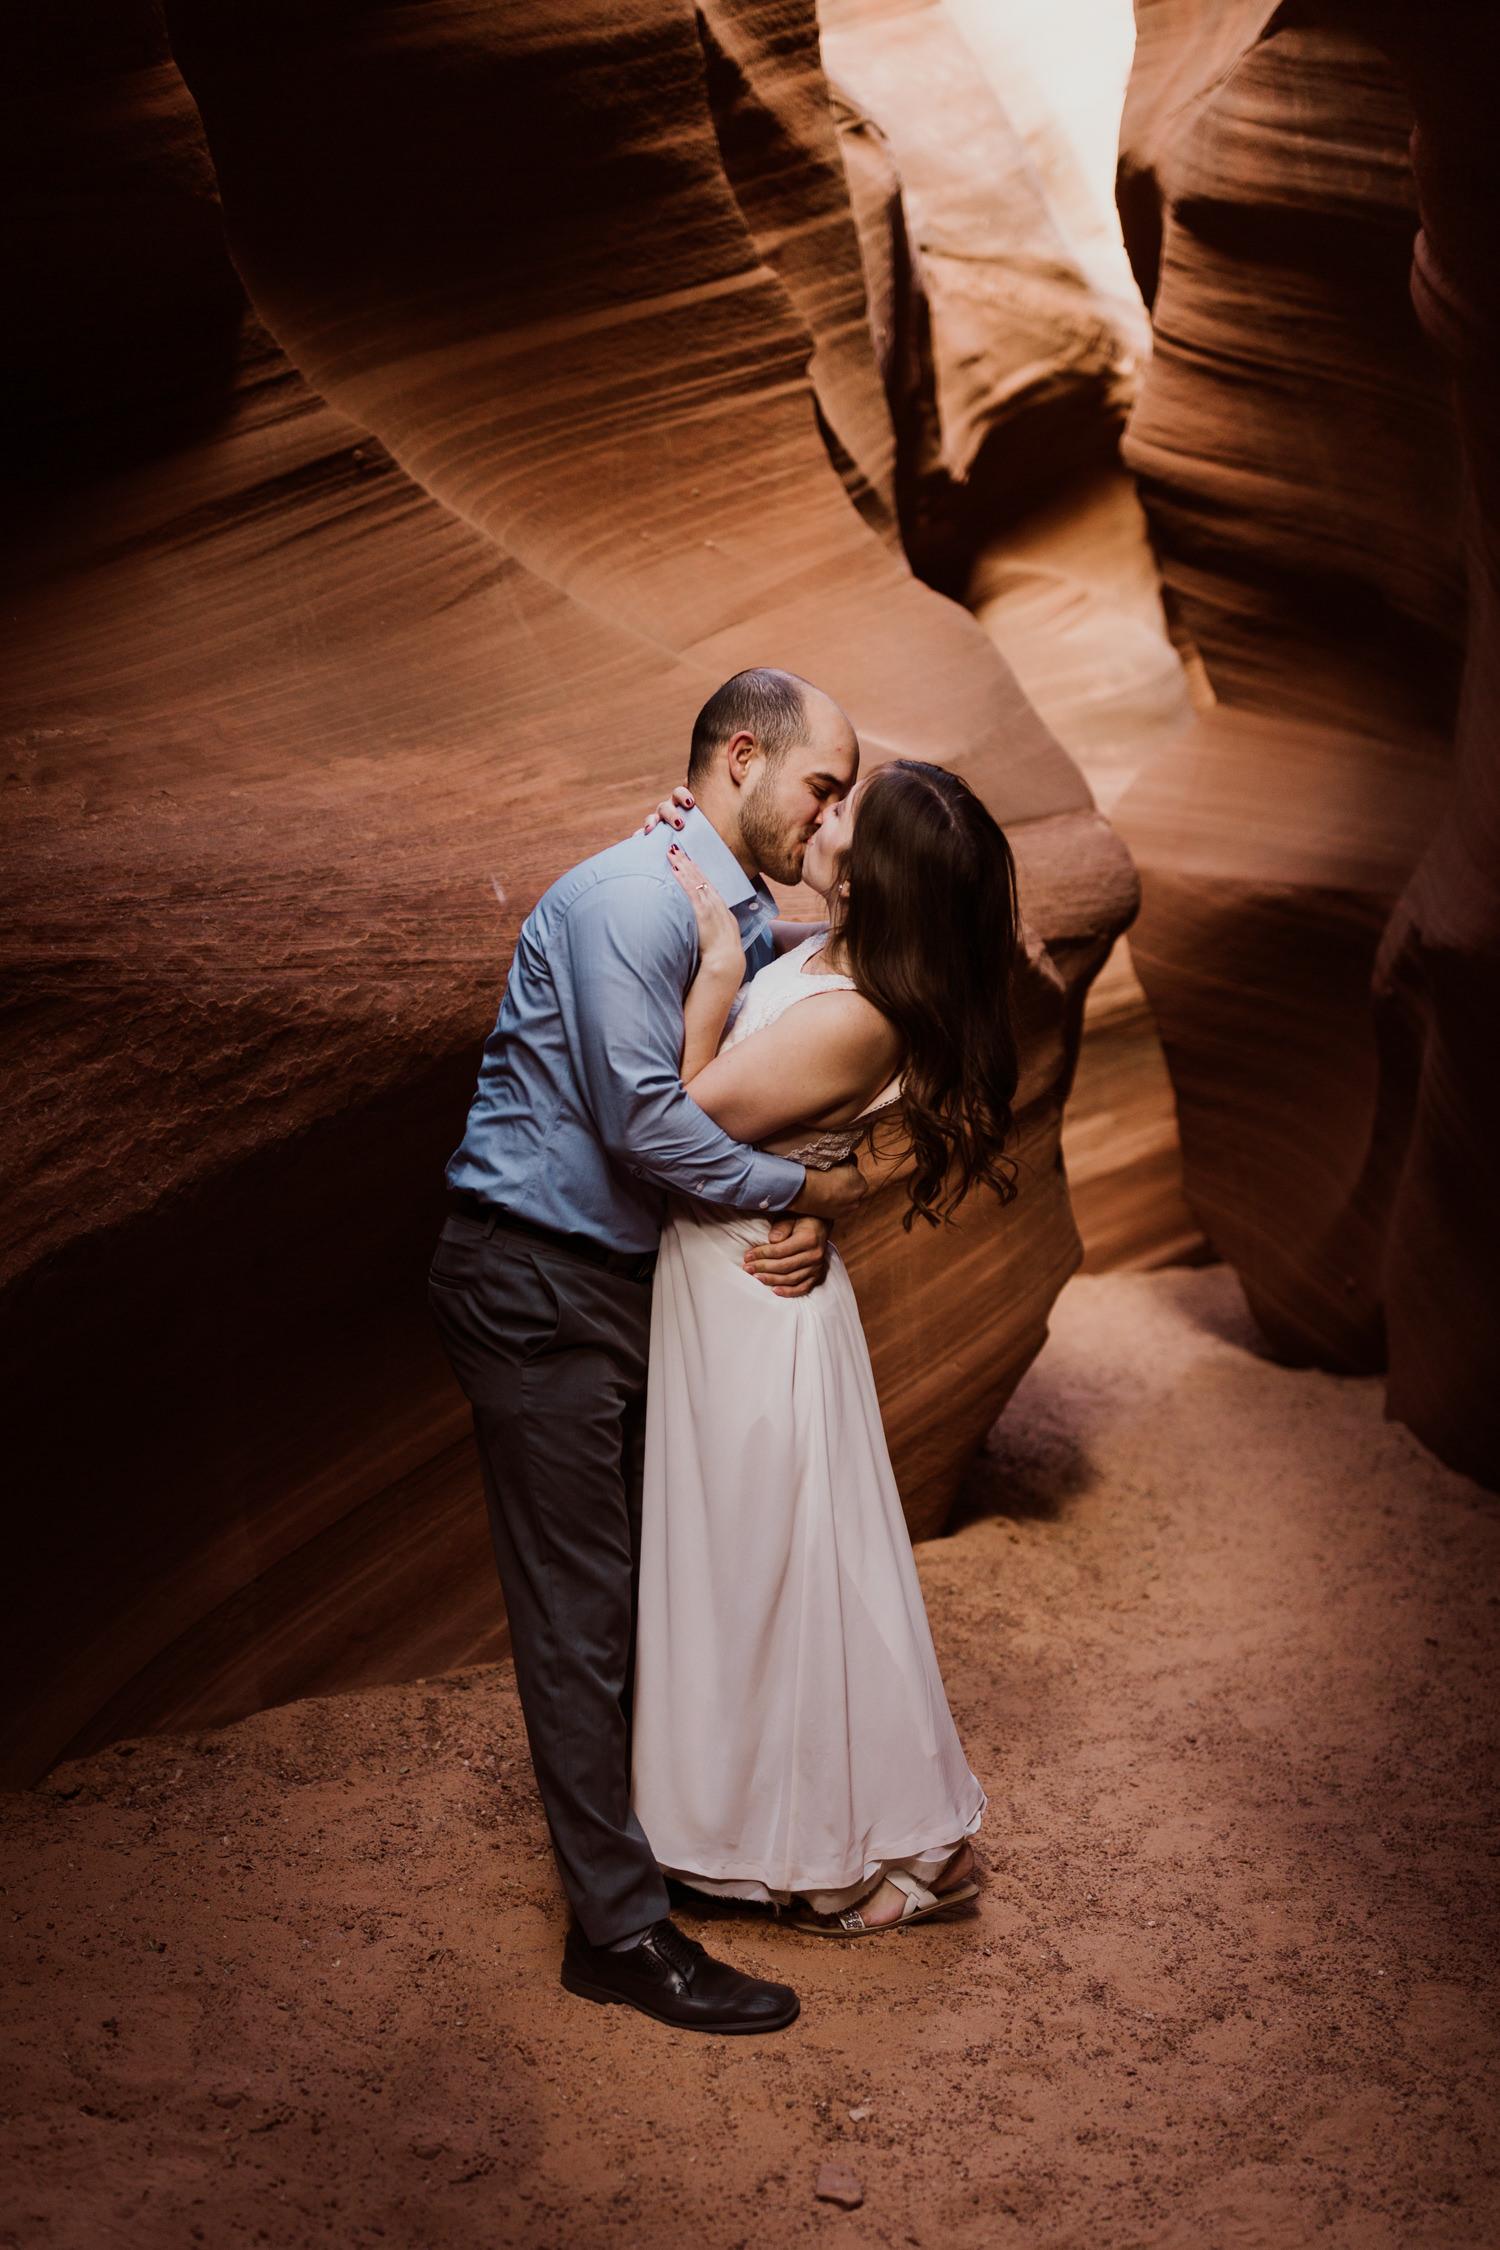 17-11-adventure-wedding-photographer-20.jpg